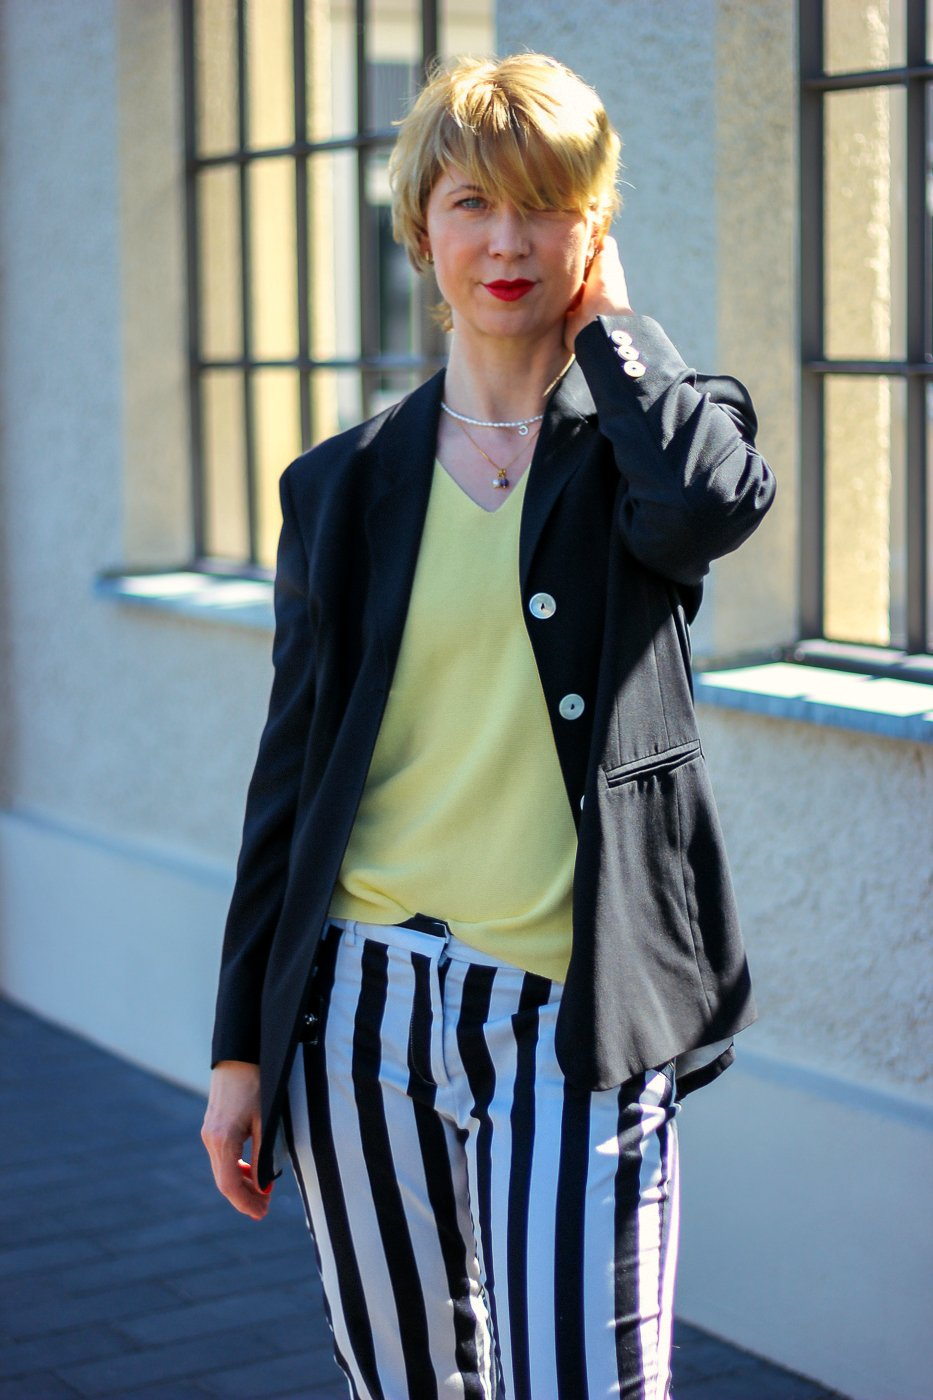 conny doll lifestyle: Blazer, Stylingchallenge, Modeflüsterin, Streifenhose,